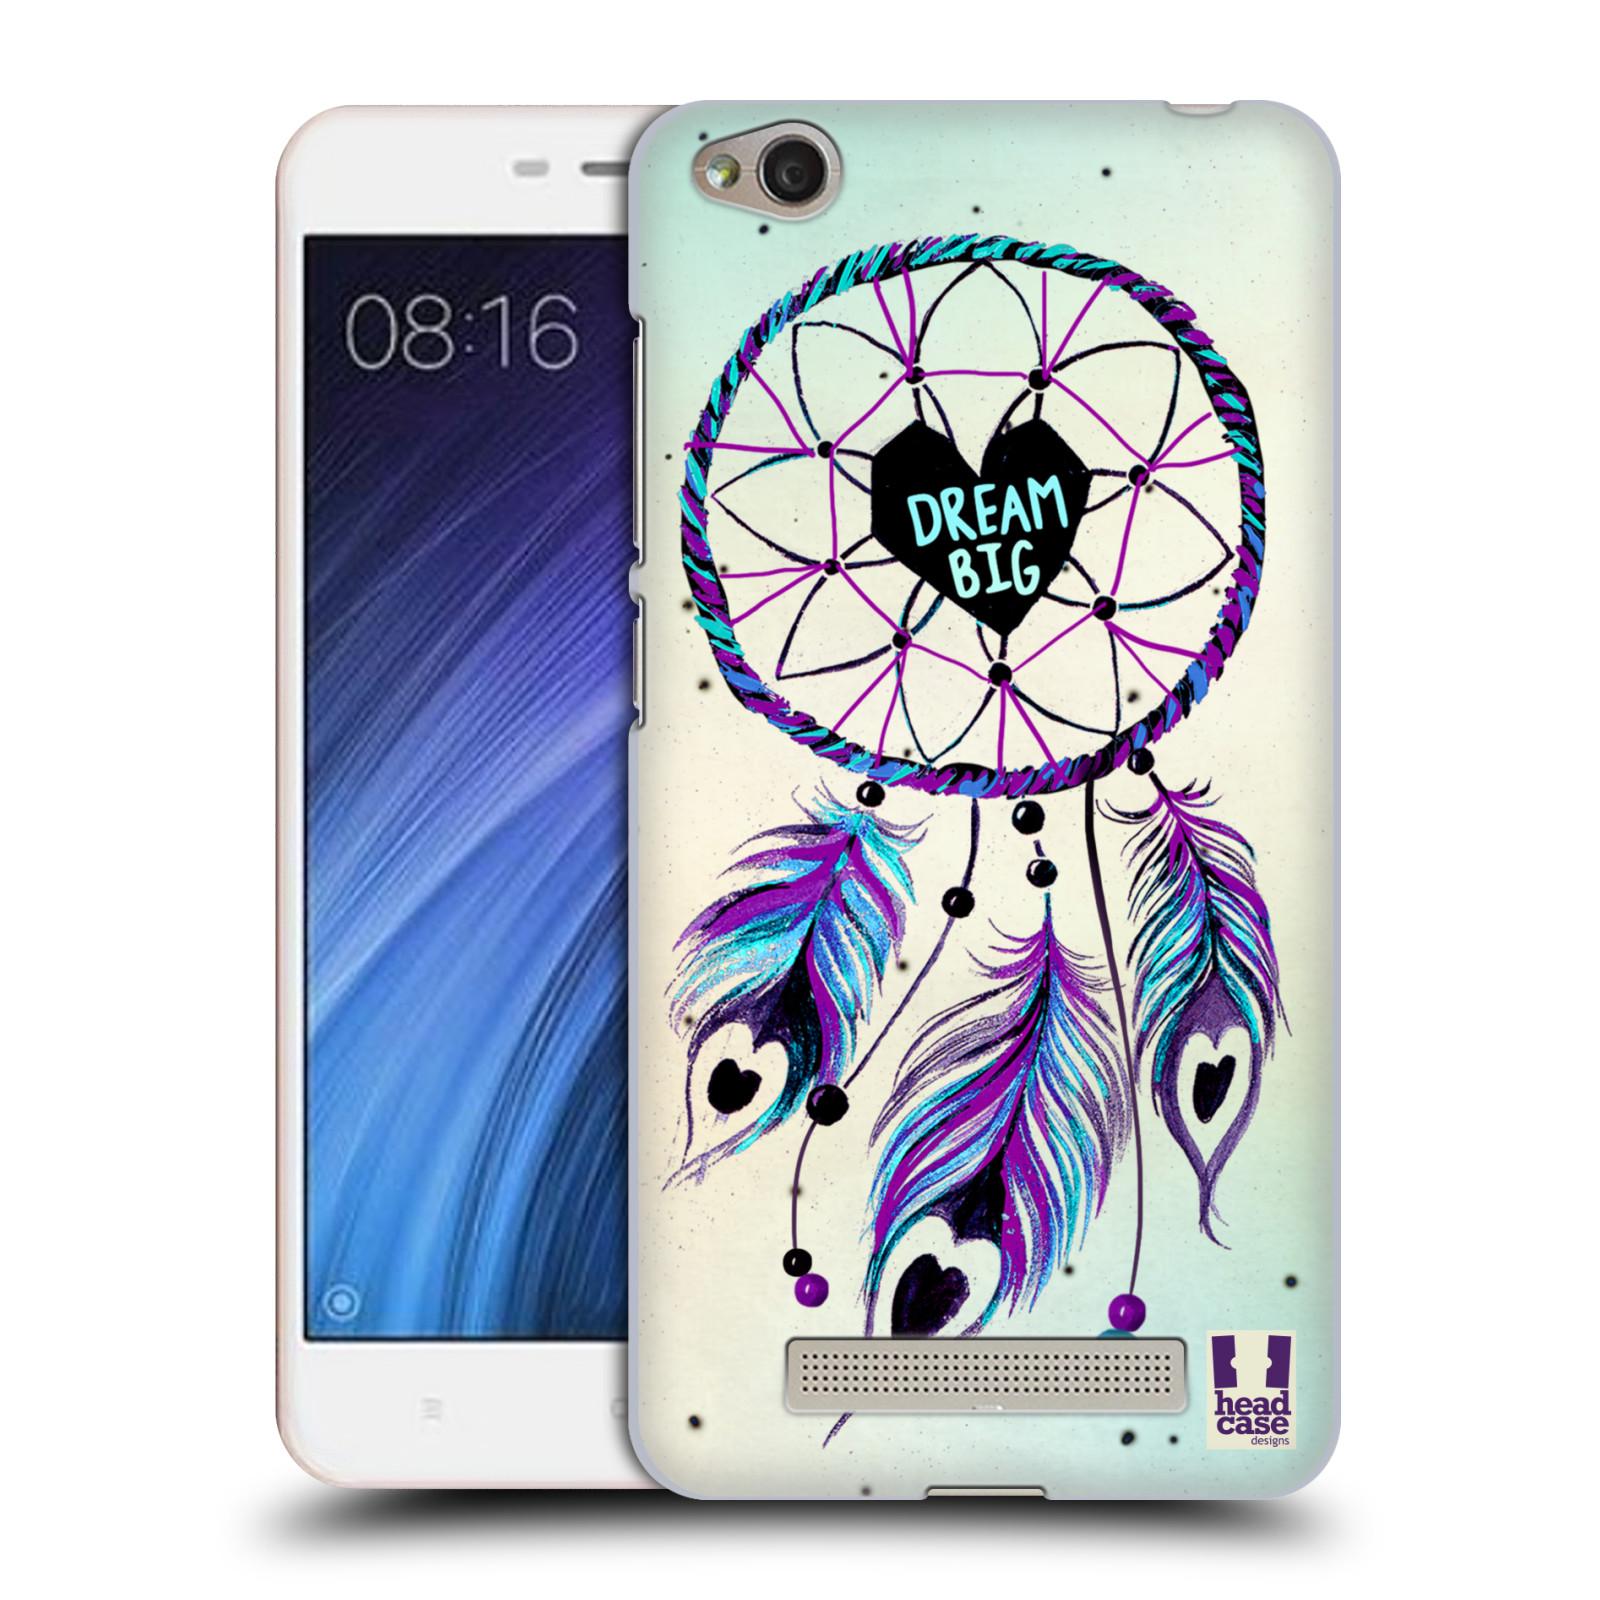 Plastové pouzdro na mobil Xiaomi Redmi 4A HEAD CASE Lapač Assorted Dream Big Srdce